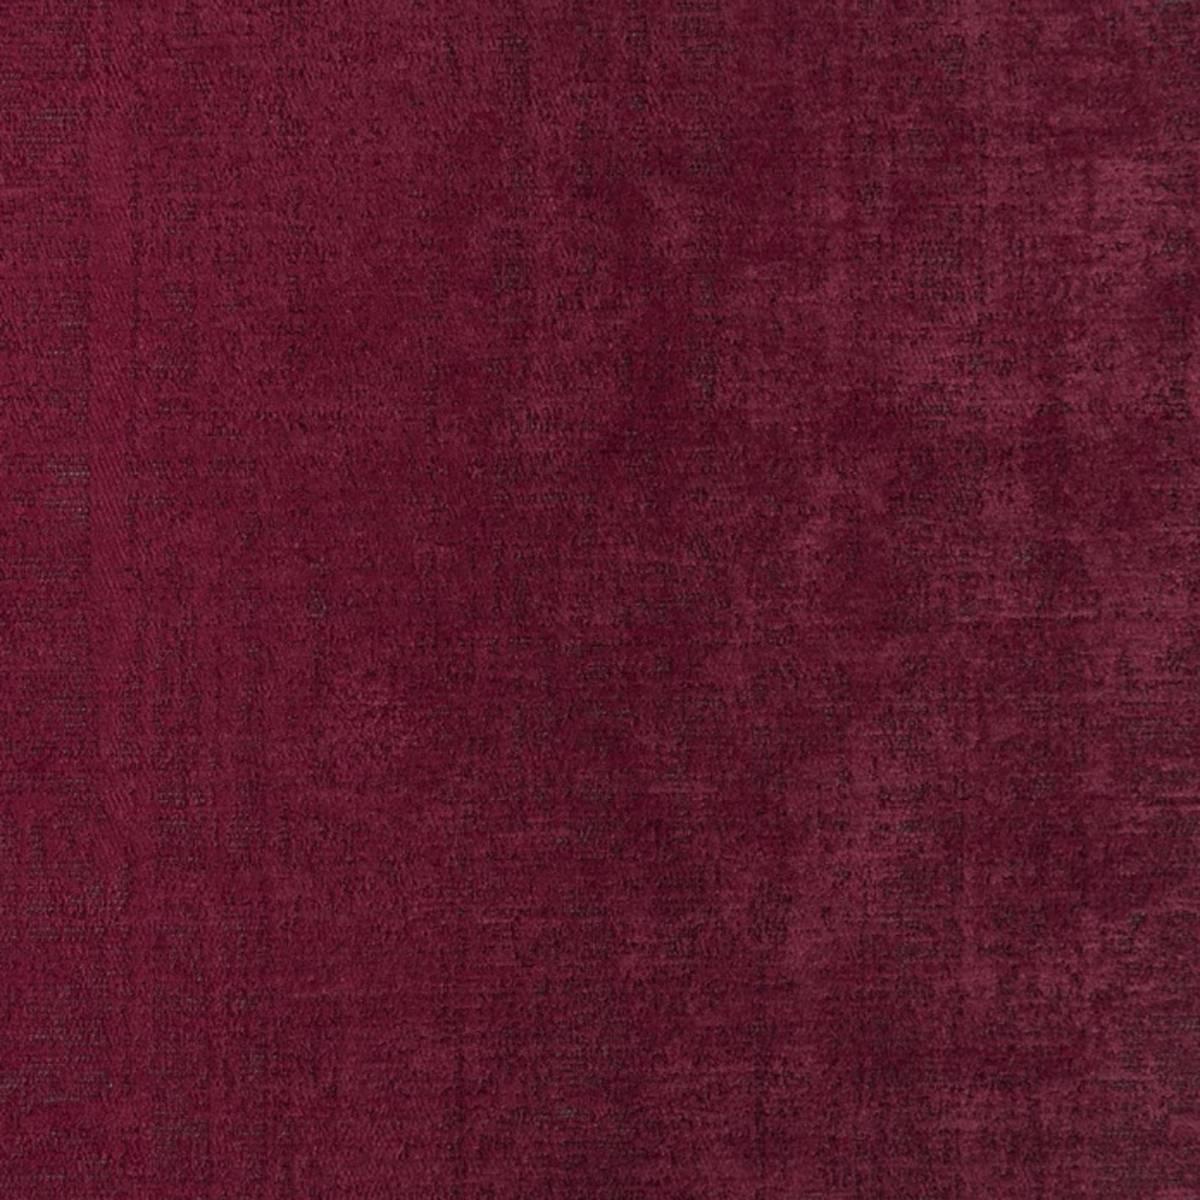 ampara fabric bordeaux f2582 33 designers guild ampara fabrics collection. Black Bedroom Furniture Sets. Home Design Ideas